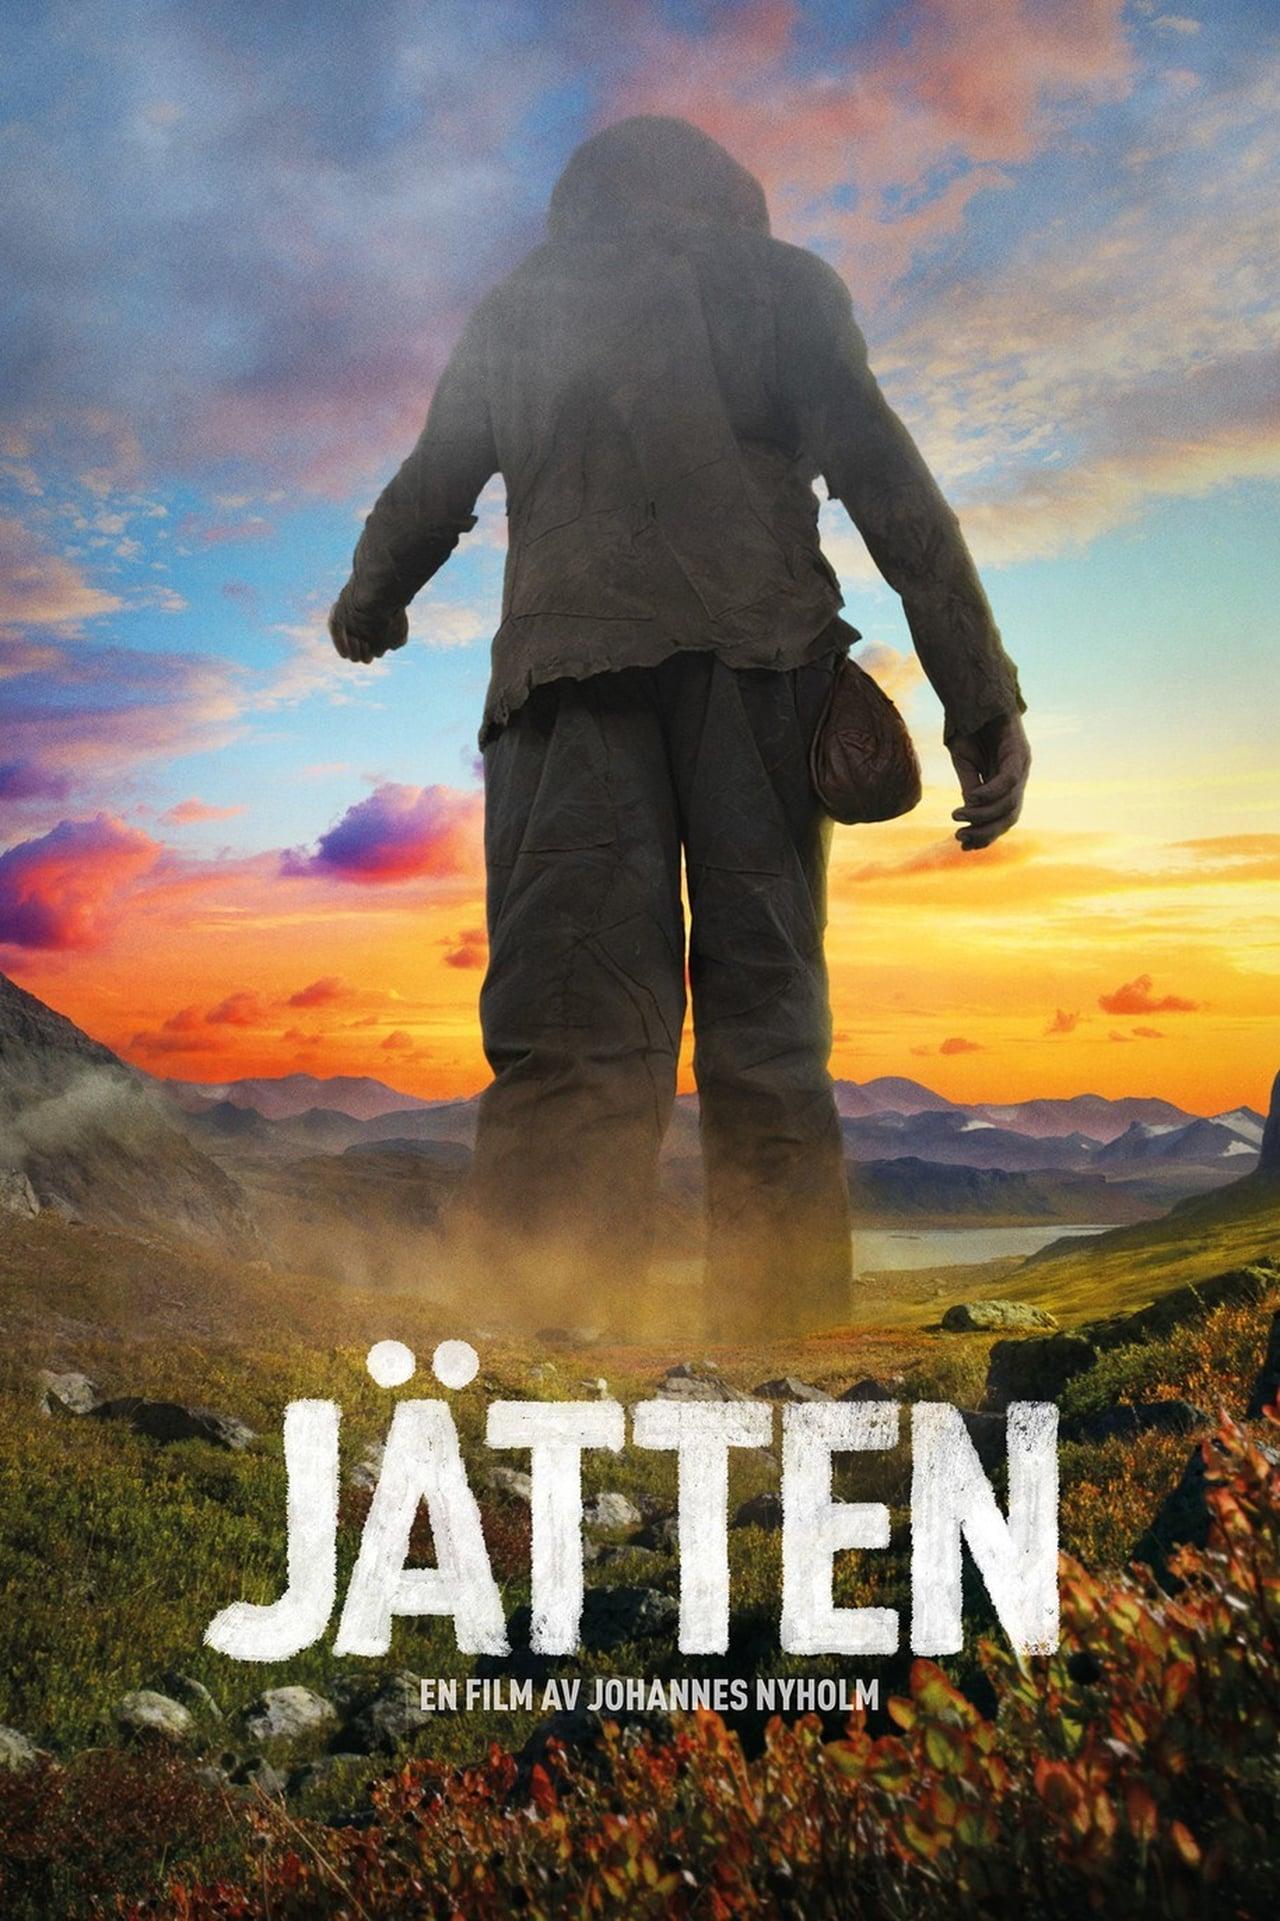 Jätten, un film de Johannes Nyholm, disponible en DVD.